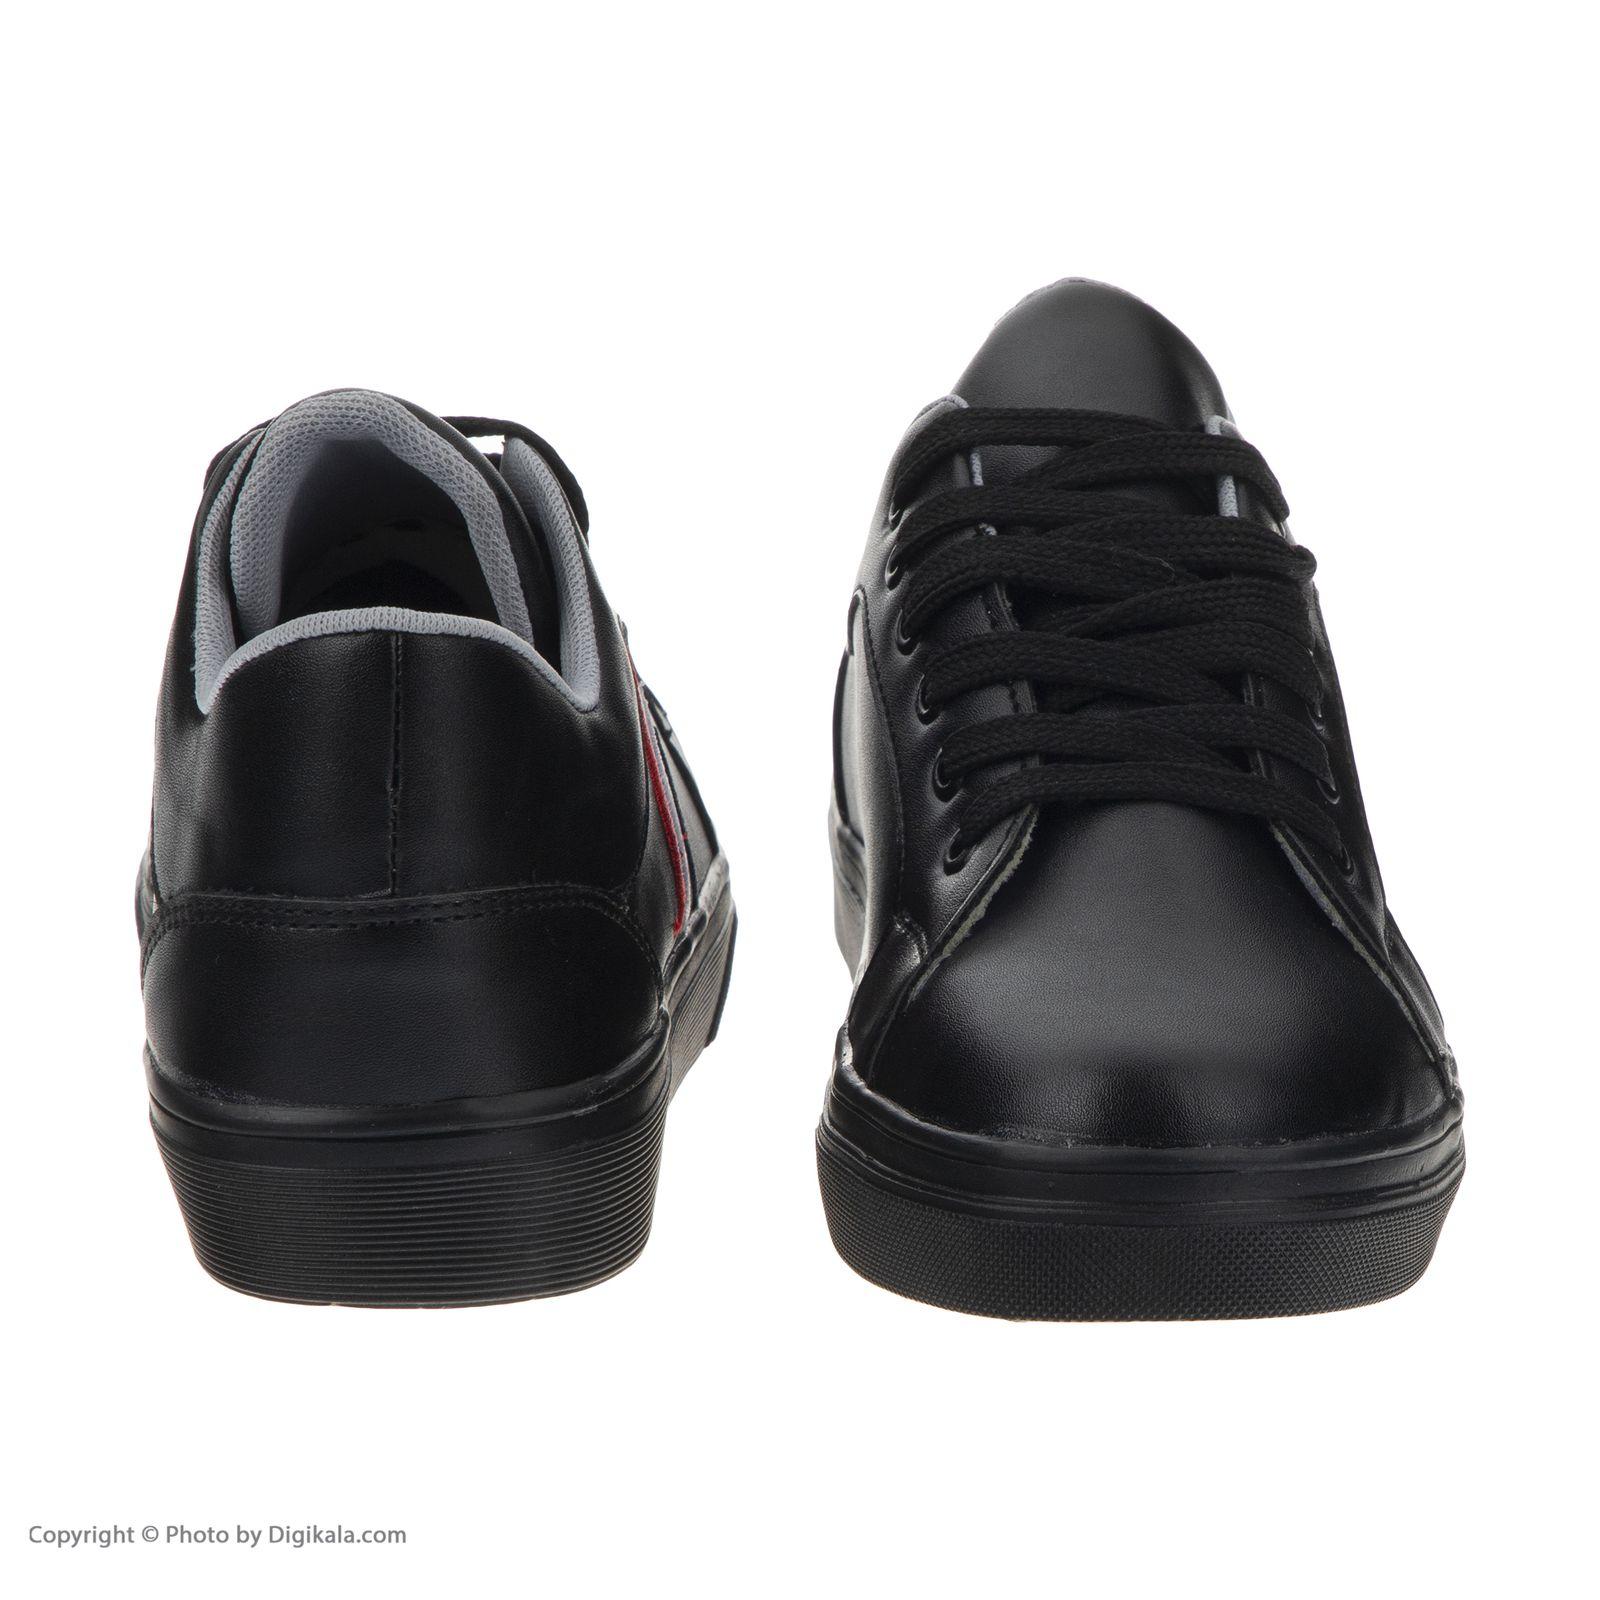 کفش روزمره زنانه مدل 4031 -  - 5